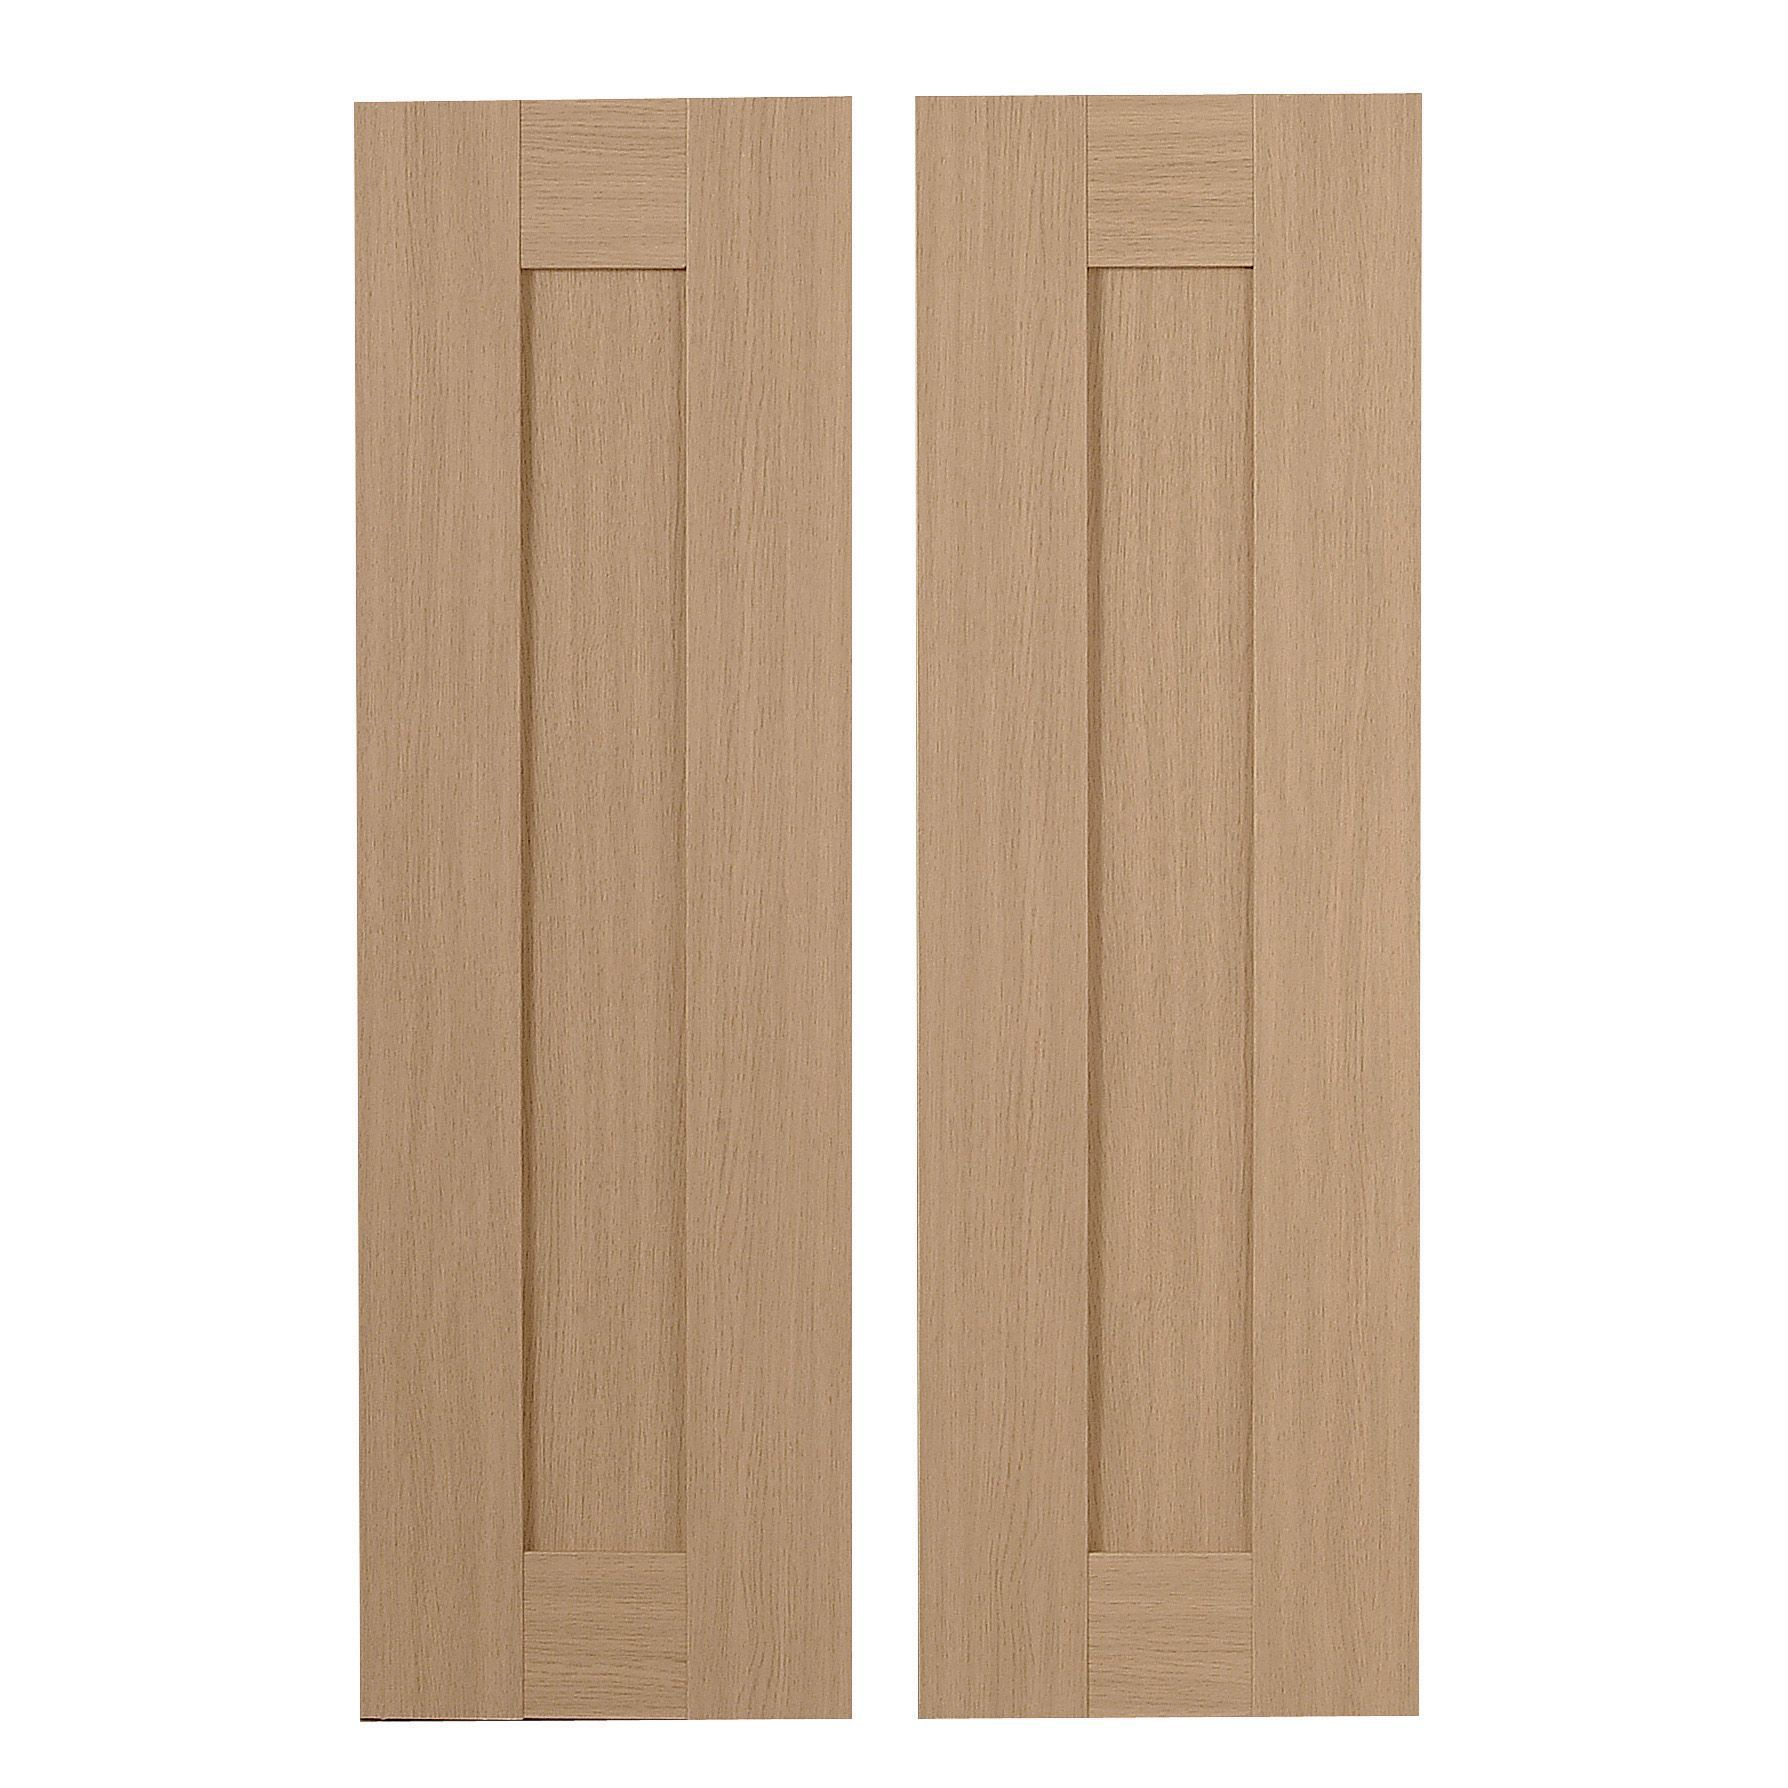 IT Kitchens Westleigh Textured Oak Effect Shaker Larder door (W)300mm Set of 2 | Departments | DIY at B\u0026Q  sc 1 st  B\u0026Q & IT Kitchens Westleigh Textured Oak Effect Shaker Larder door (W ...